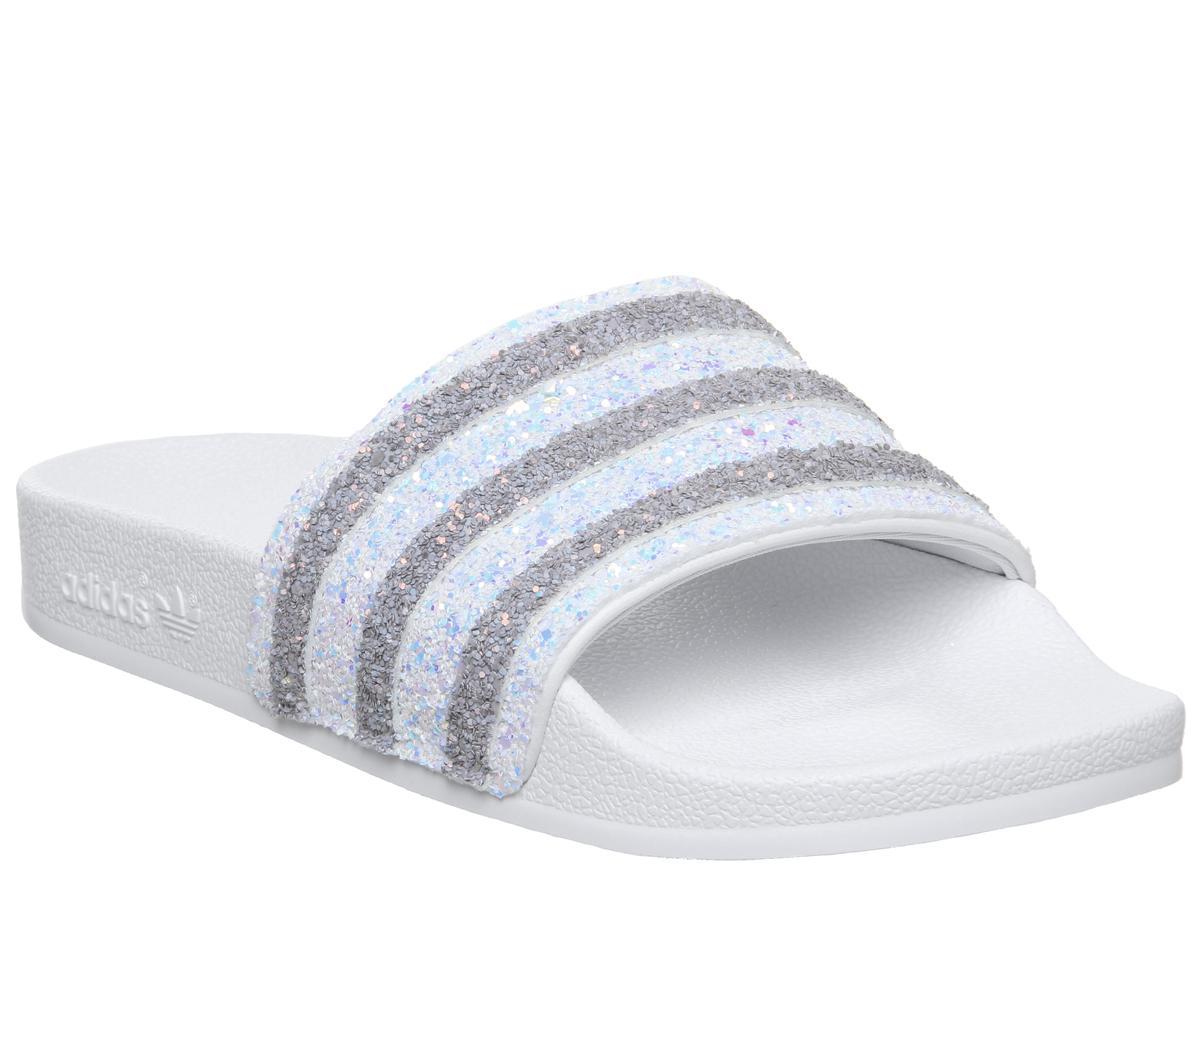 adidas Adilette Sliders White Glitter